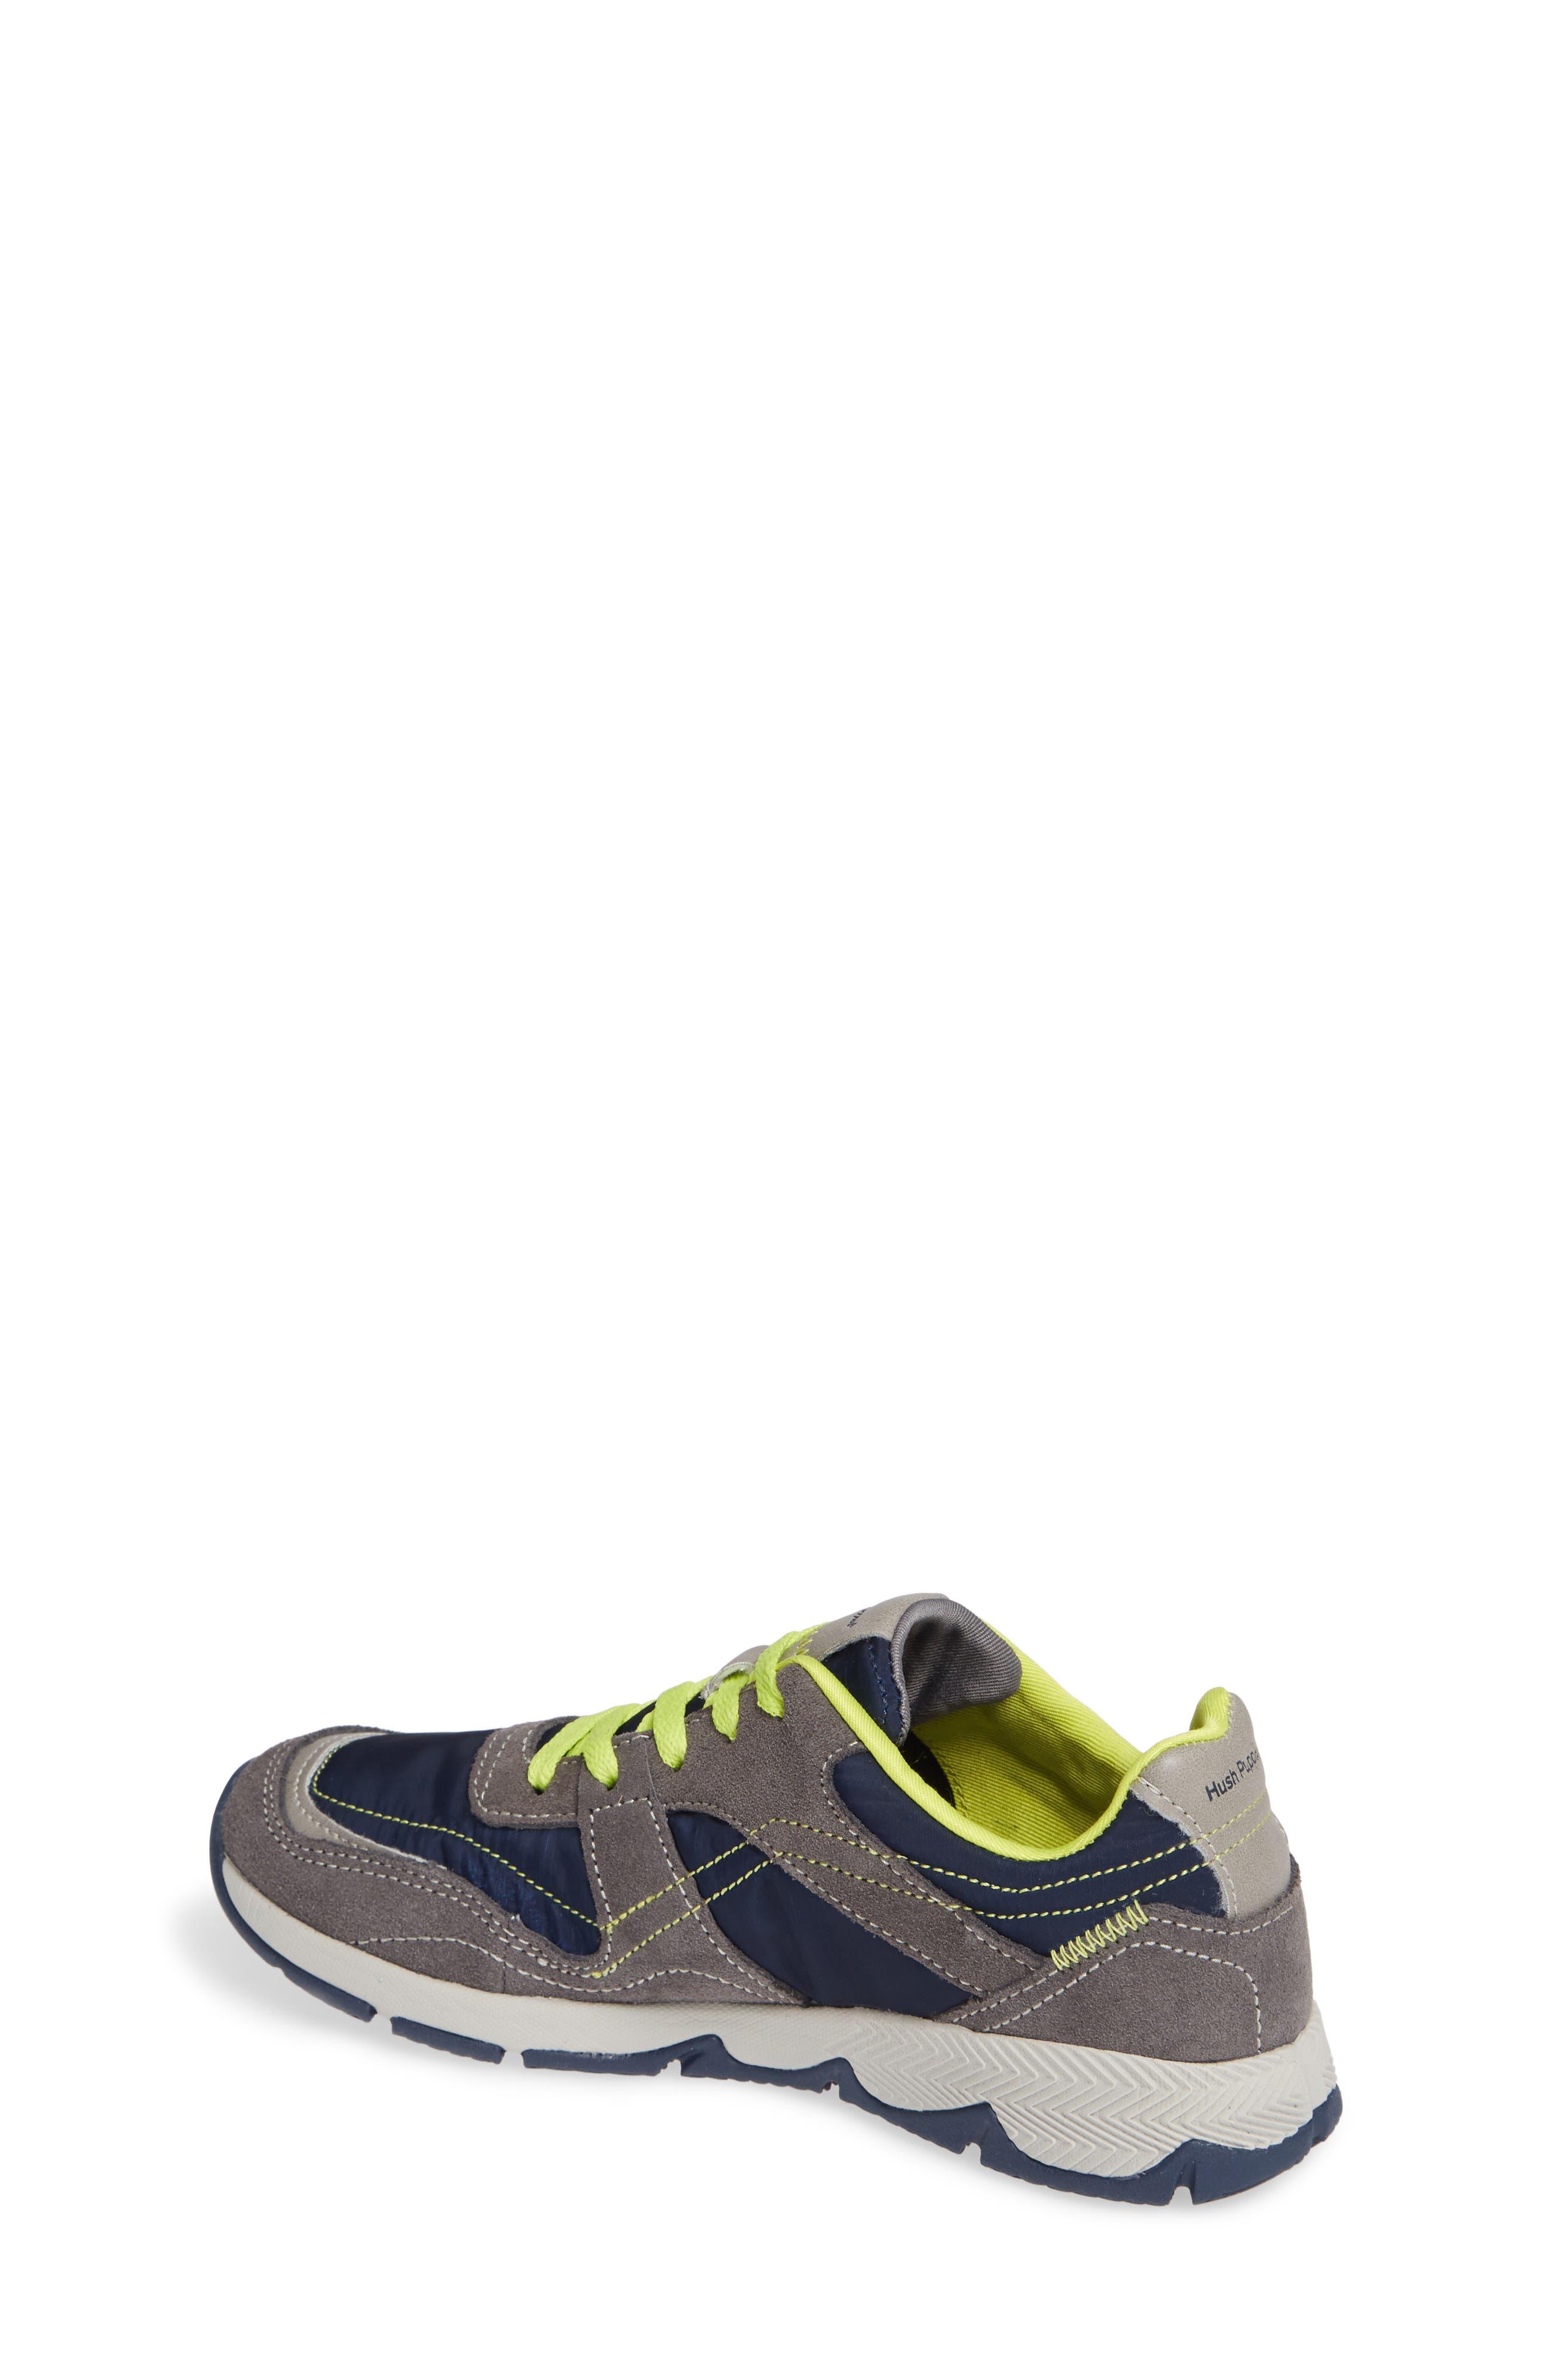 Zev TS Field Sneaker,                             Alternate thumbnail 2, color,                             GREY/ NAVY